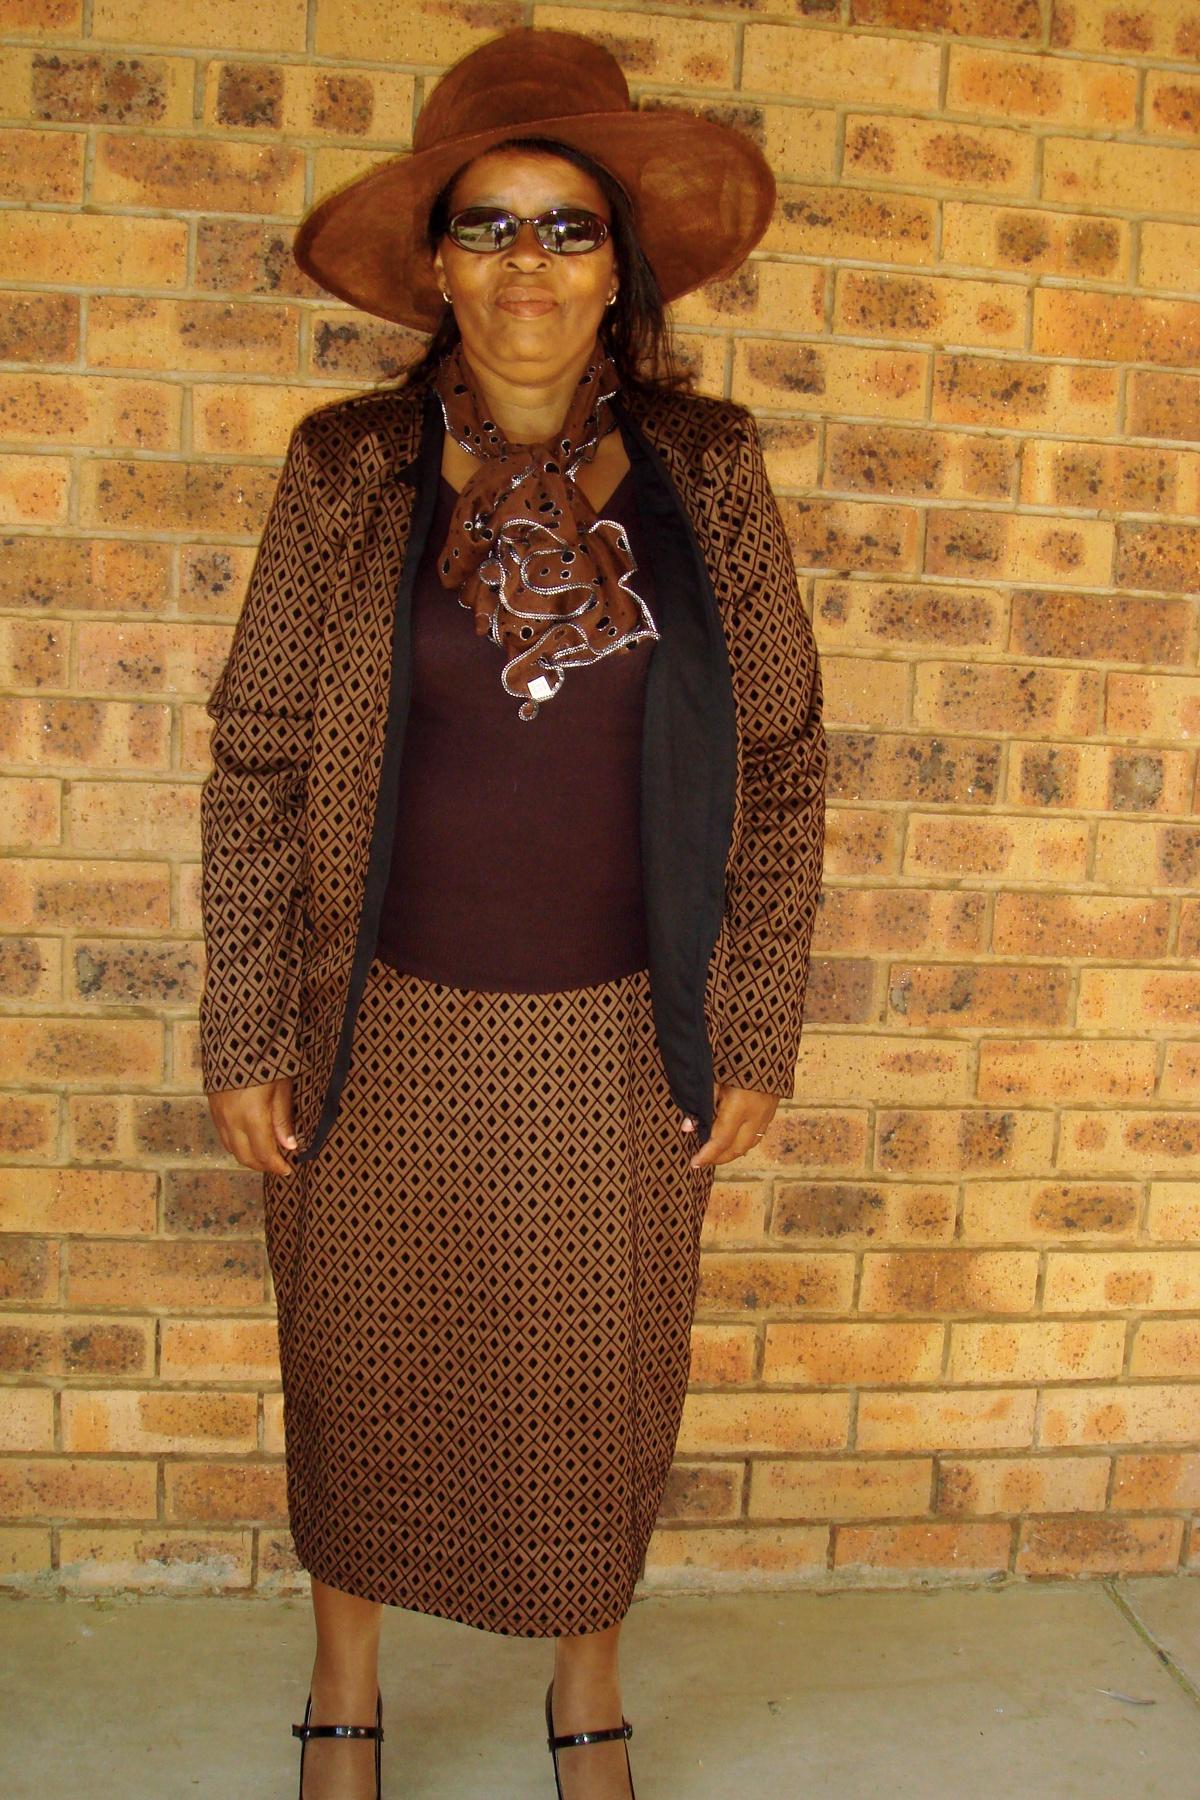 Sister Apostle Vaulisi